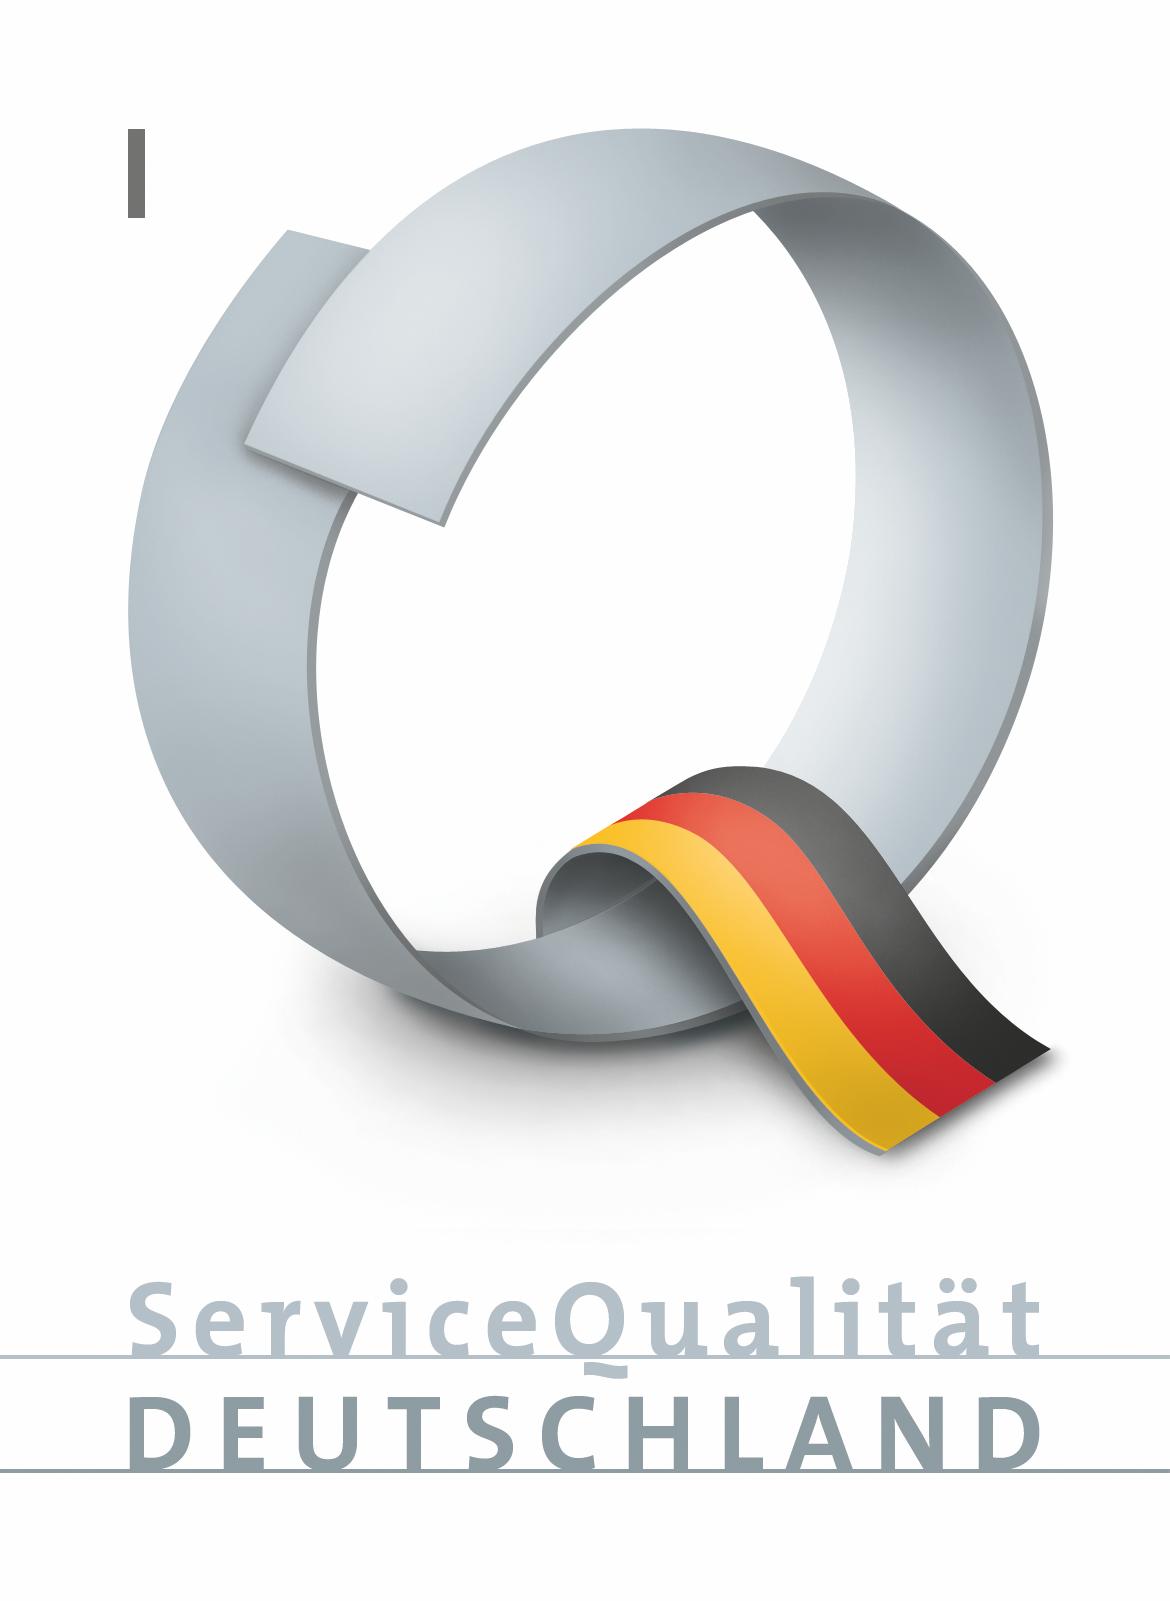 Pictogramm Service Qualität